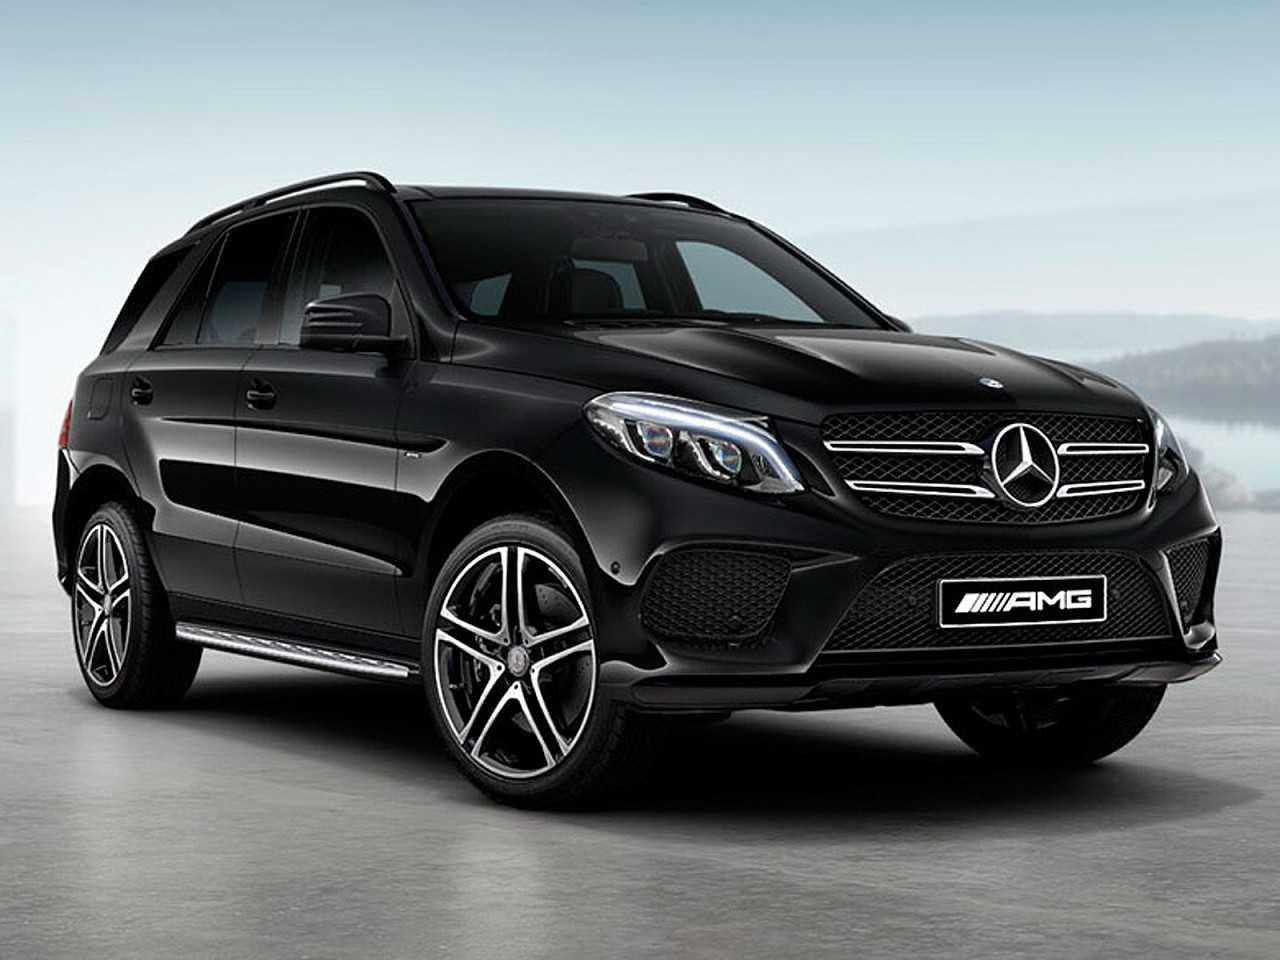 Mercedes-Benz GLE 450 AMG 4Matic Black Edition